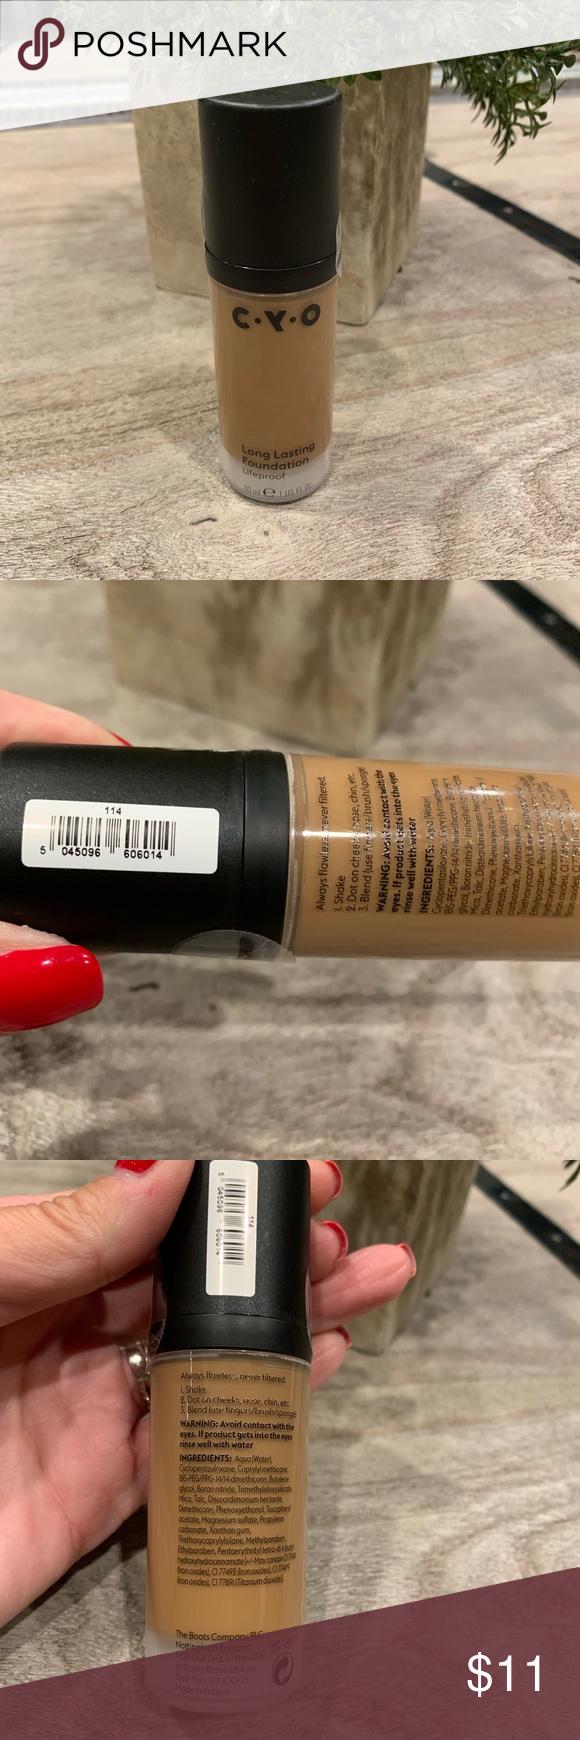 Helen 🍕 on Soap and glory, Soap and glory makeup, Beauty